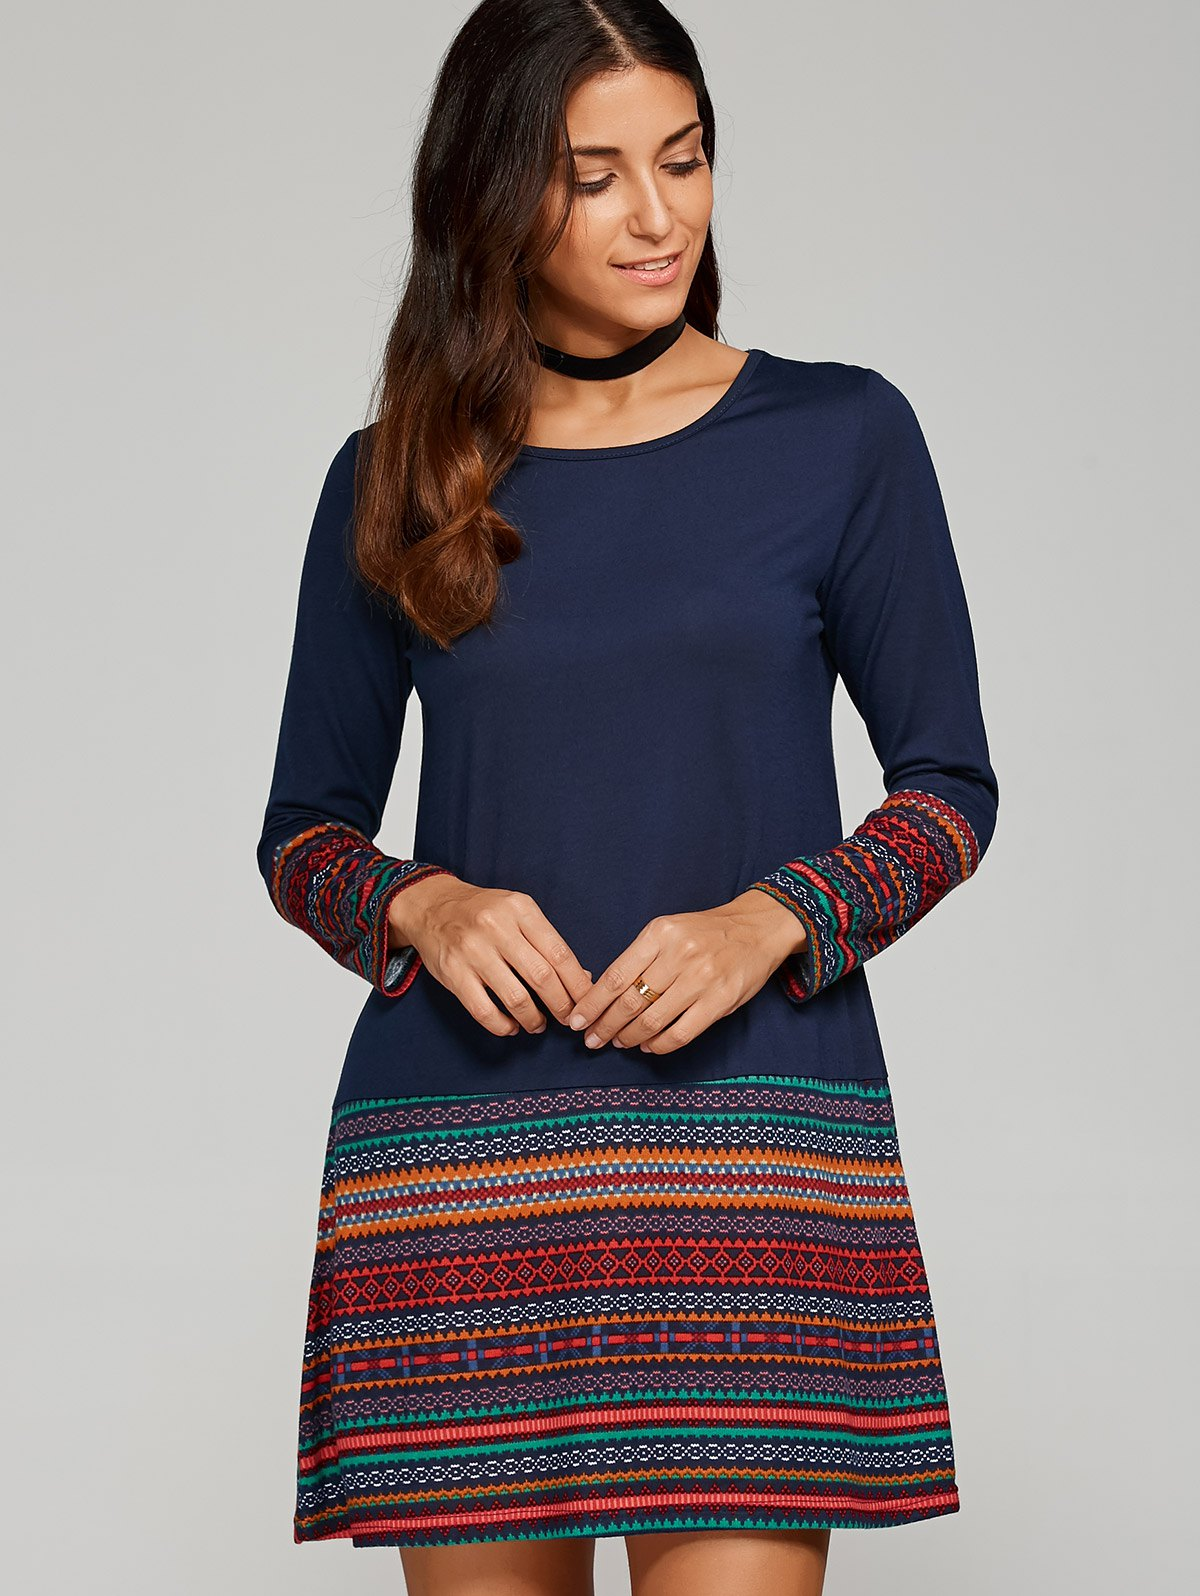 Tribal Print Trim Dress